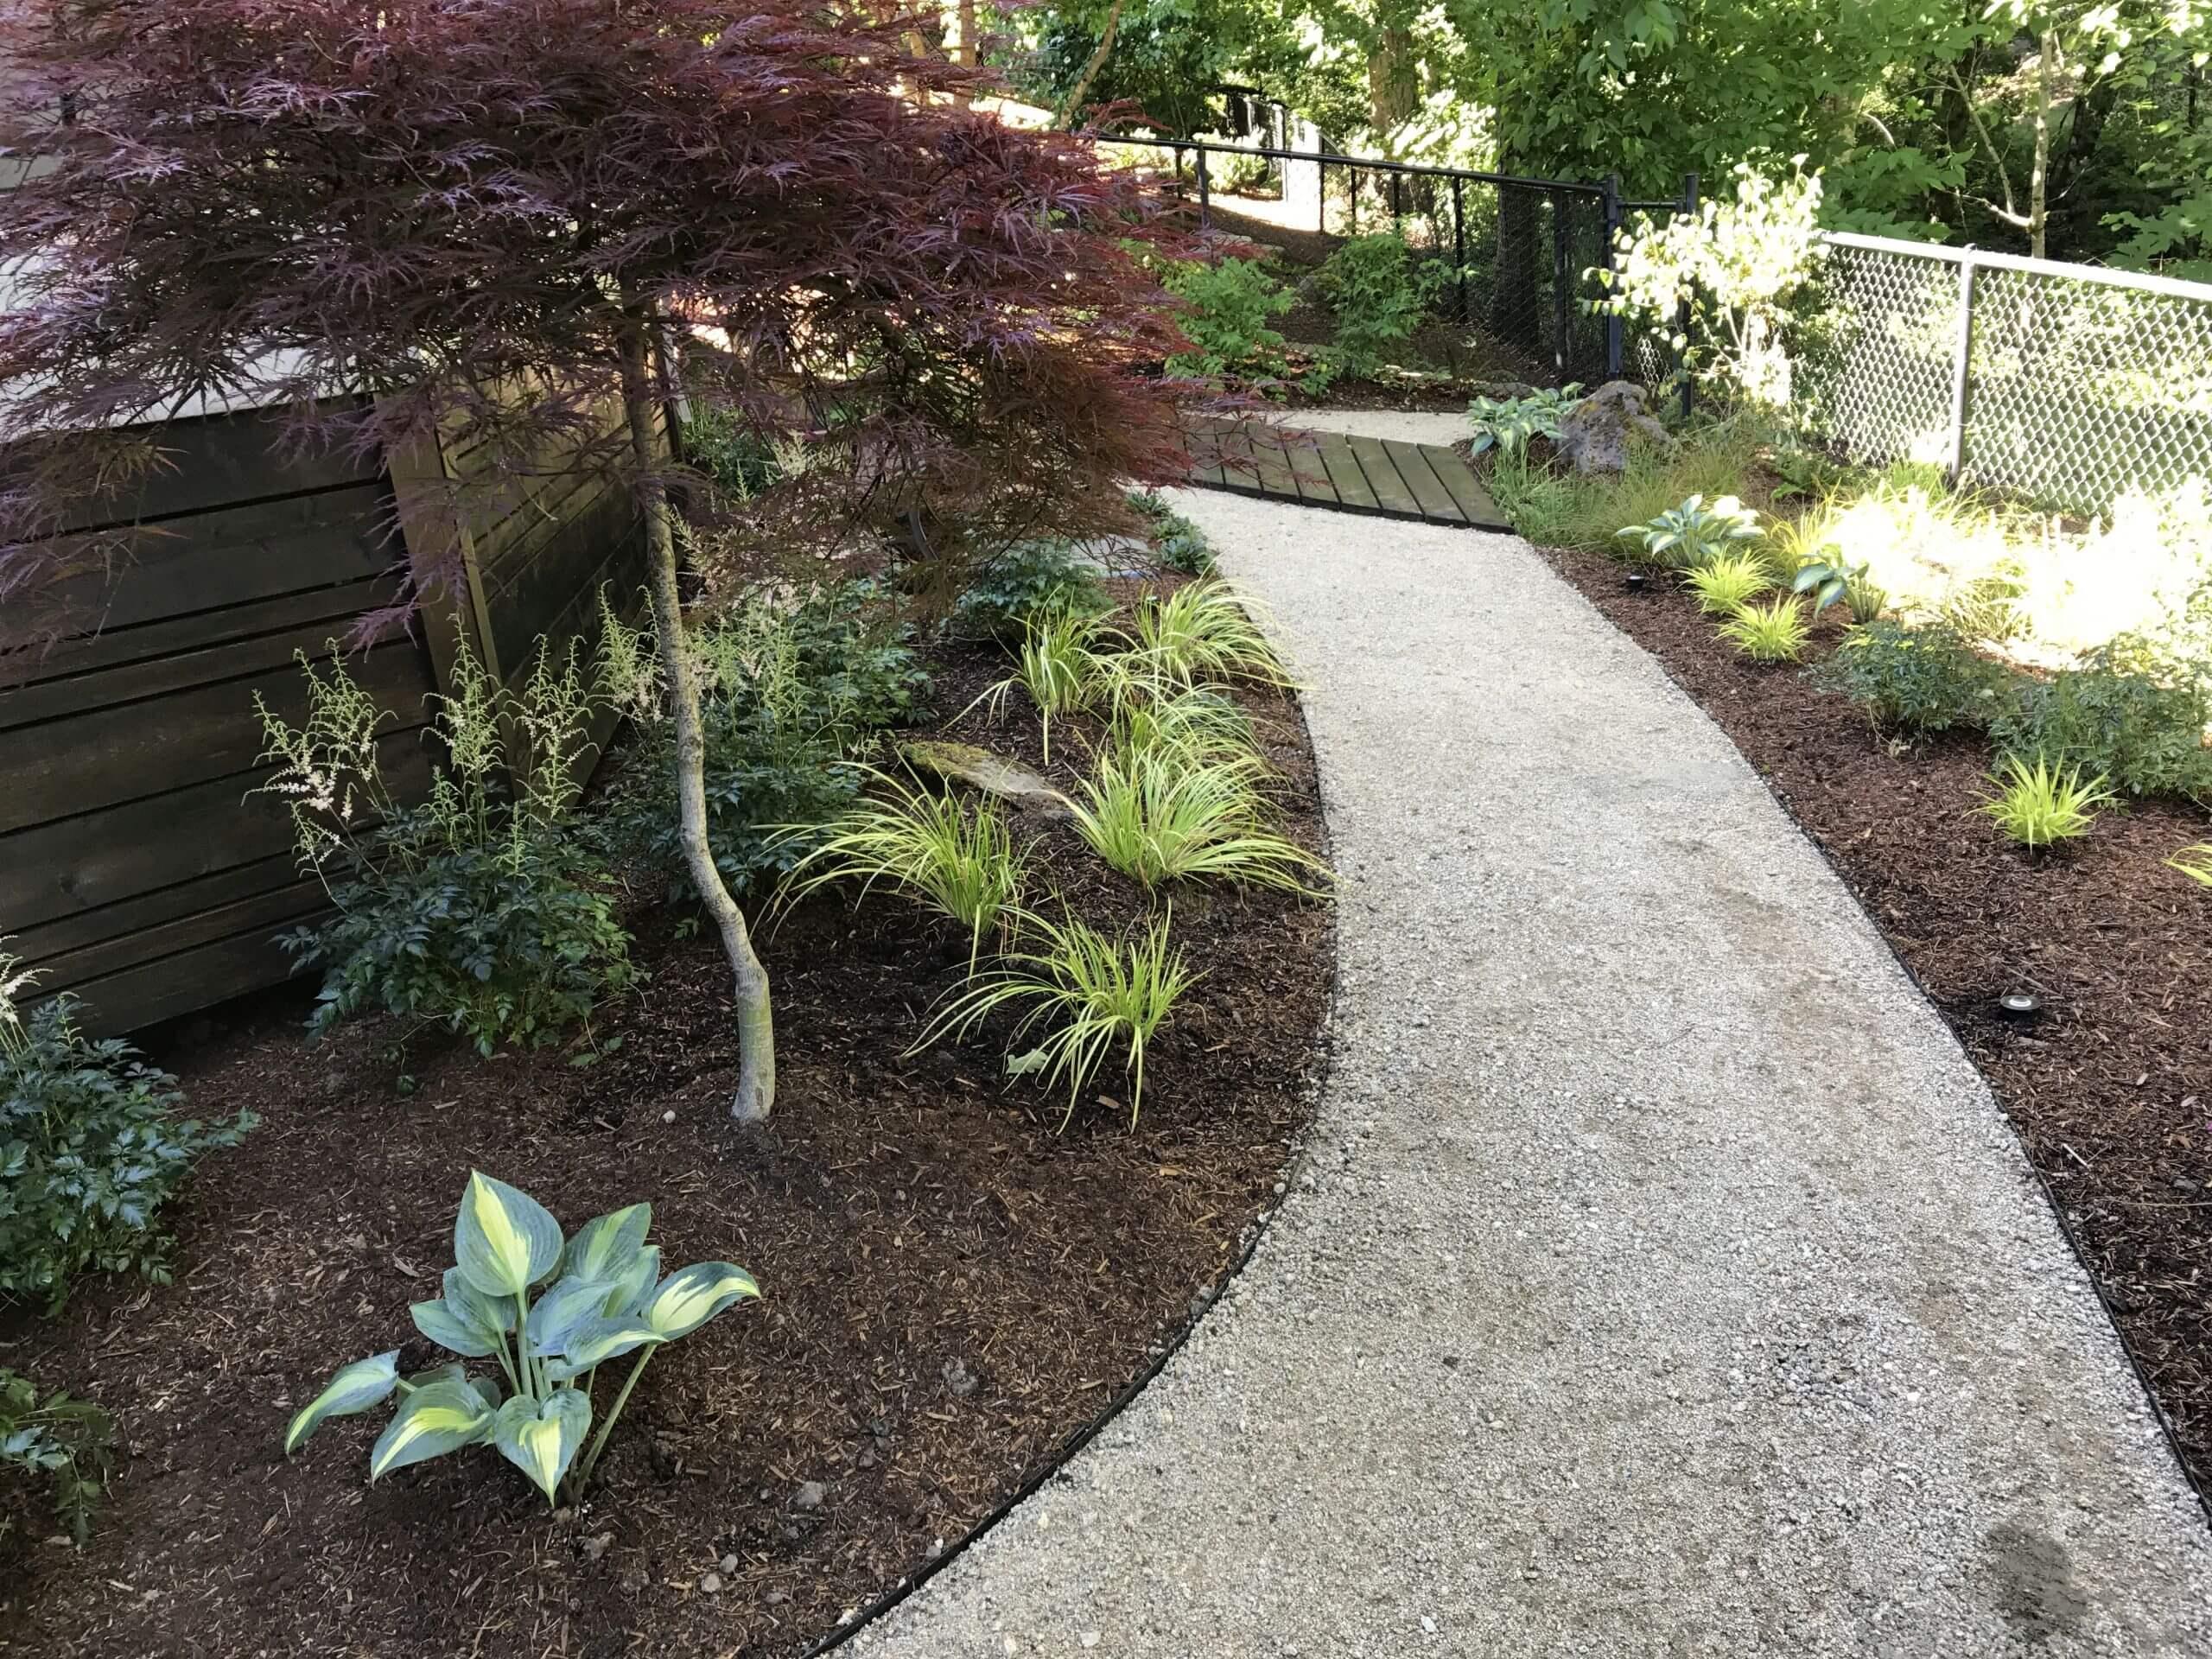 https://shovelandthumb.sfo3.digitaloceanspaces.com/patios walkways/walkway 3